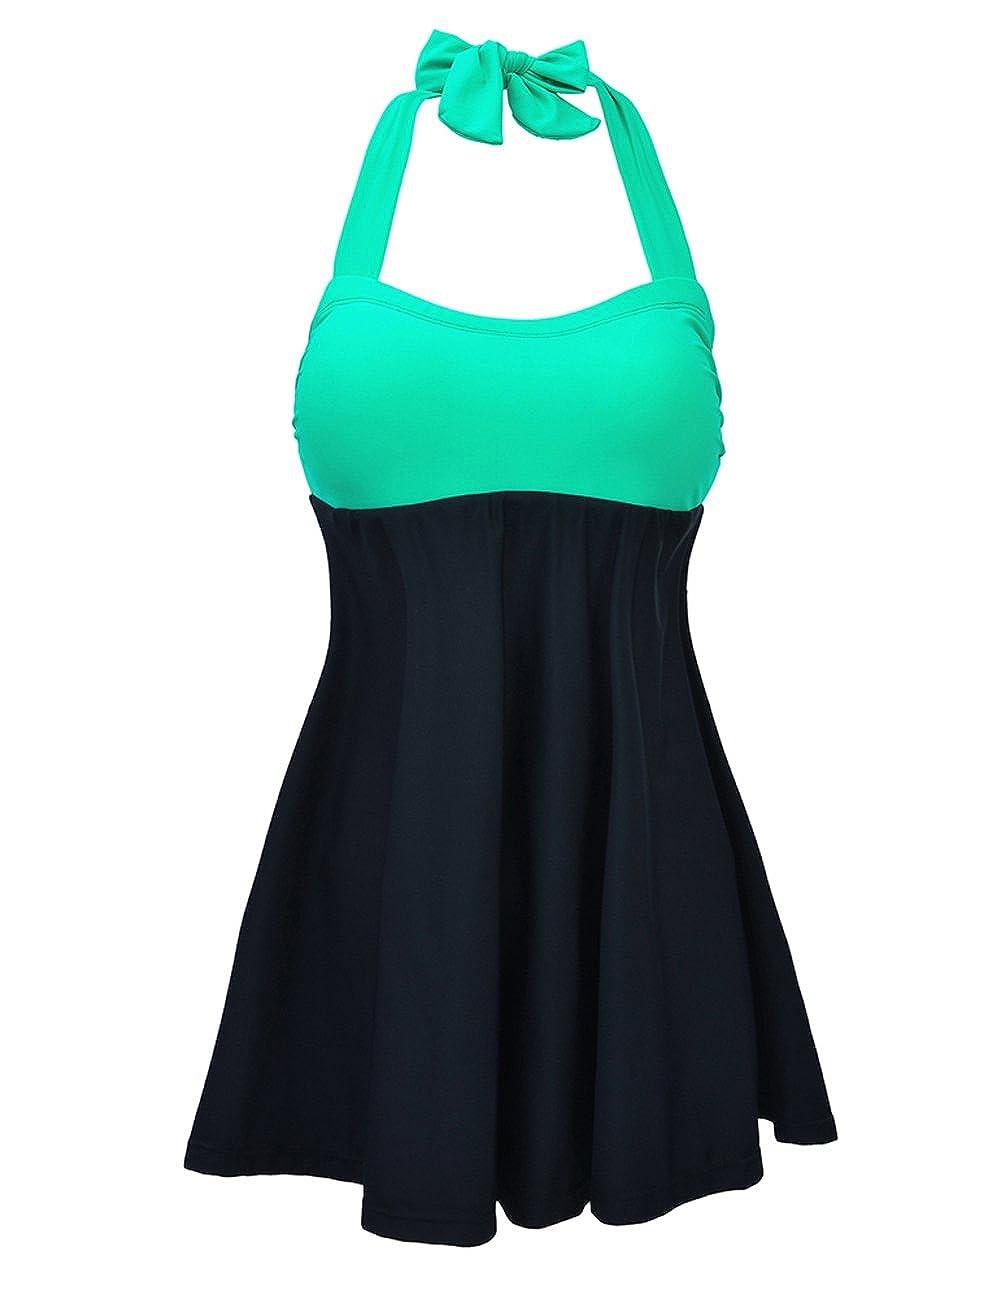 Green & Black JOYMODE Women's Halter Swimwear One Two Piece Swimsuit Skirtini Swimdress with Boyshort